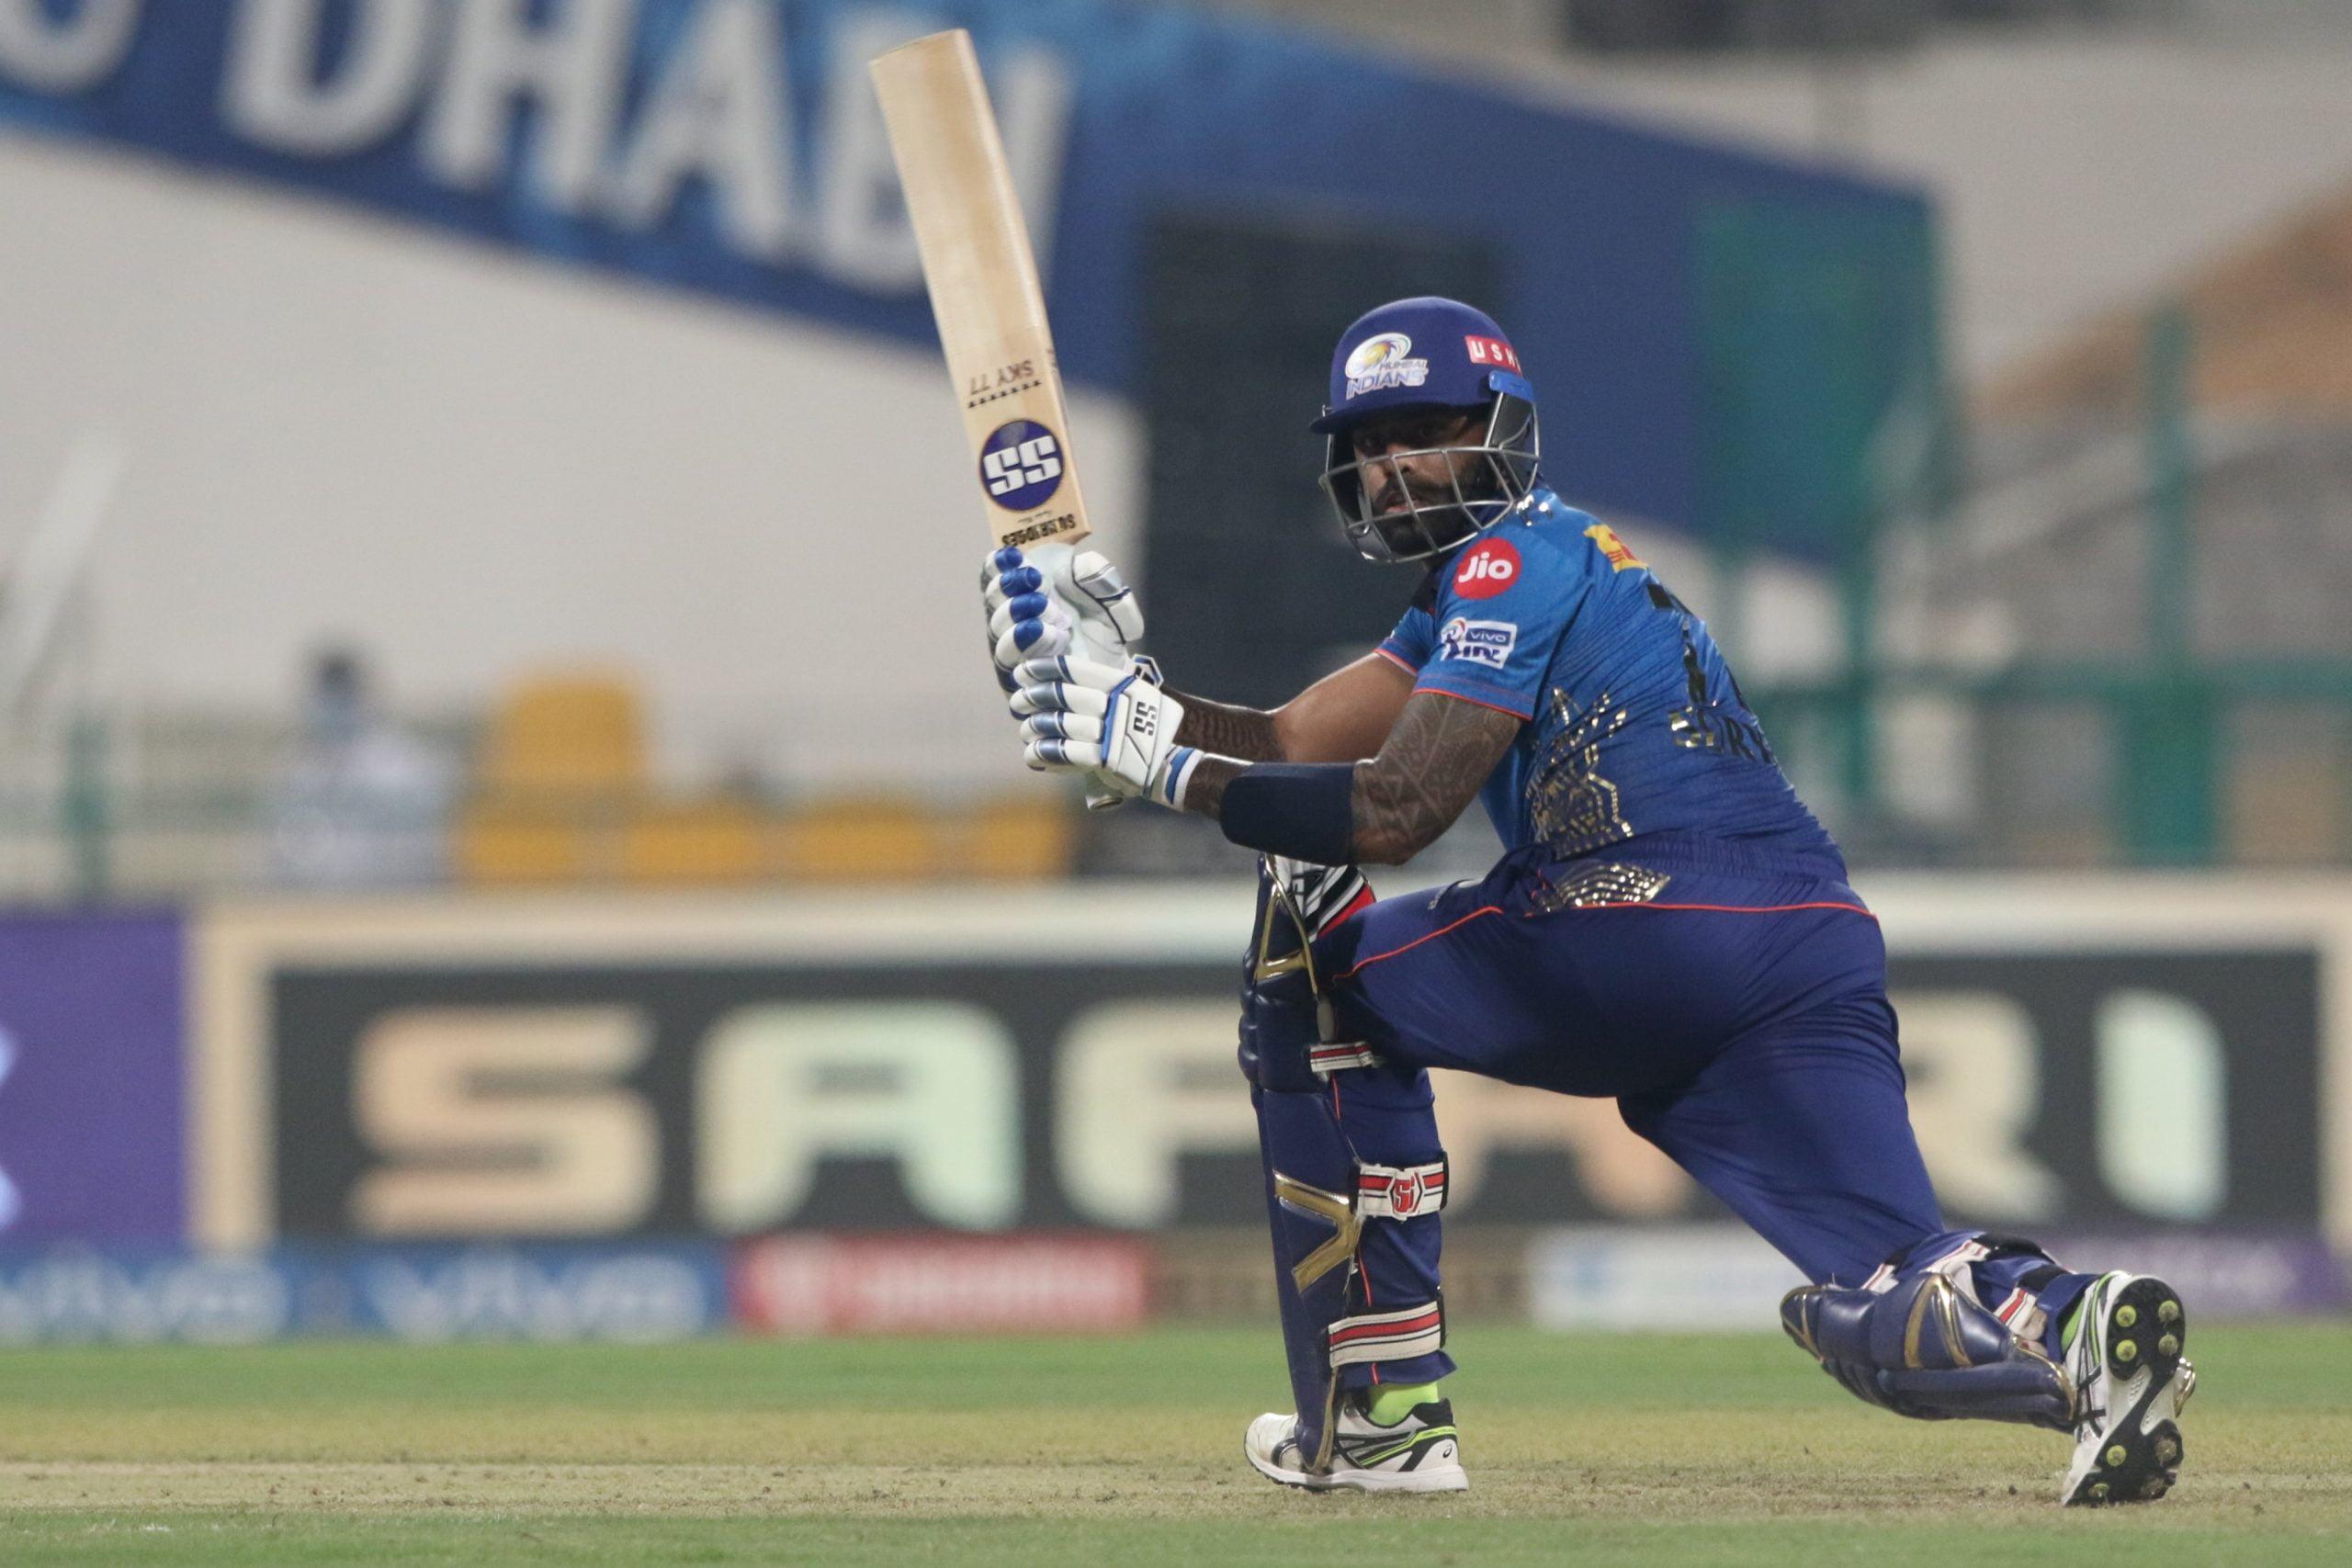 IPL 2021: Umran Malik Rattles Suryakumar Yadav With A Bouncer, Twitter Reacts